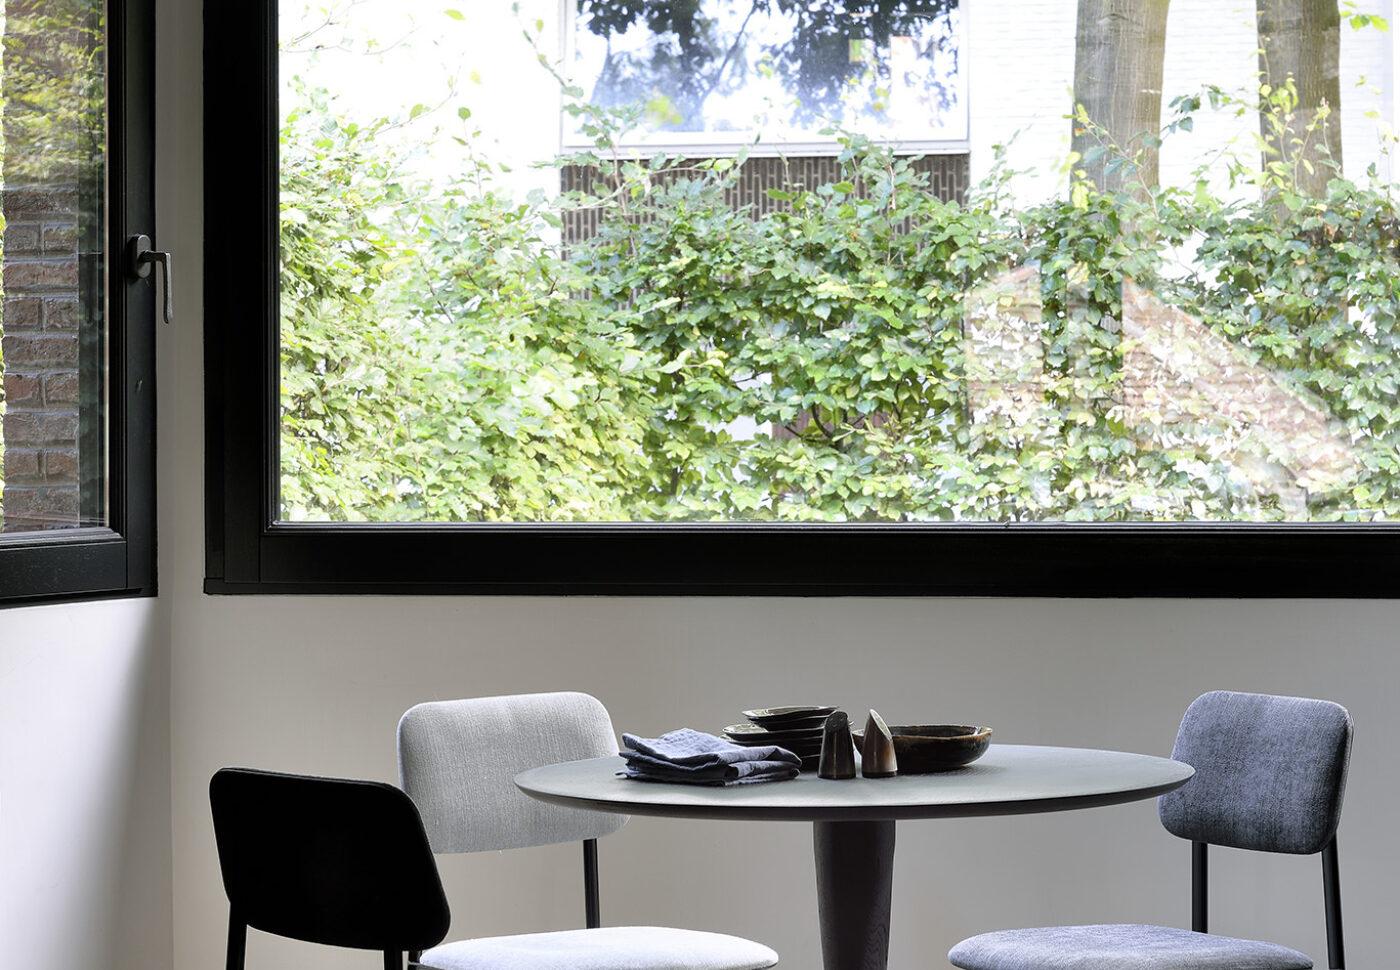 50011 Black Oak Torsion dining table 60078 DC chair dark grey 60079 DC chair light grey 60080 DC chair dark blue